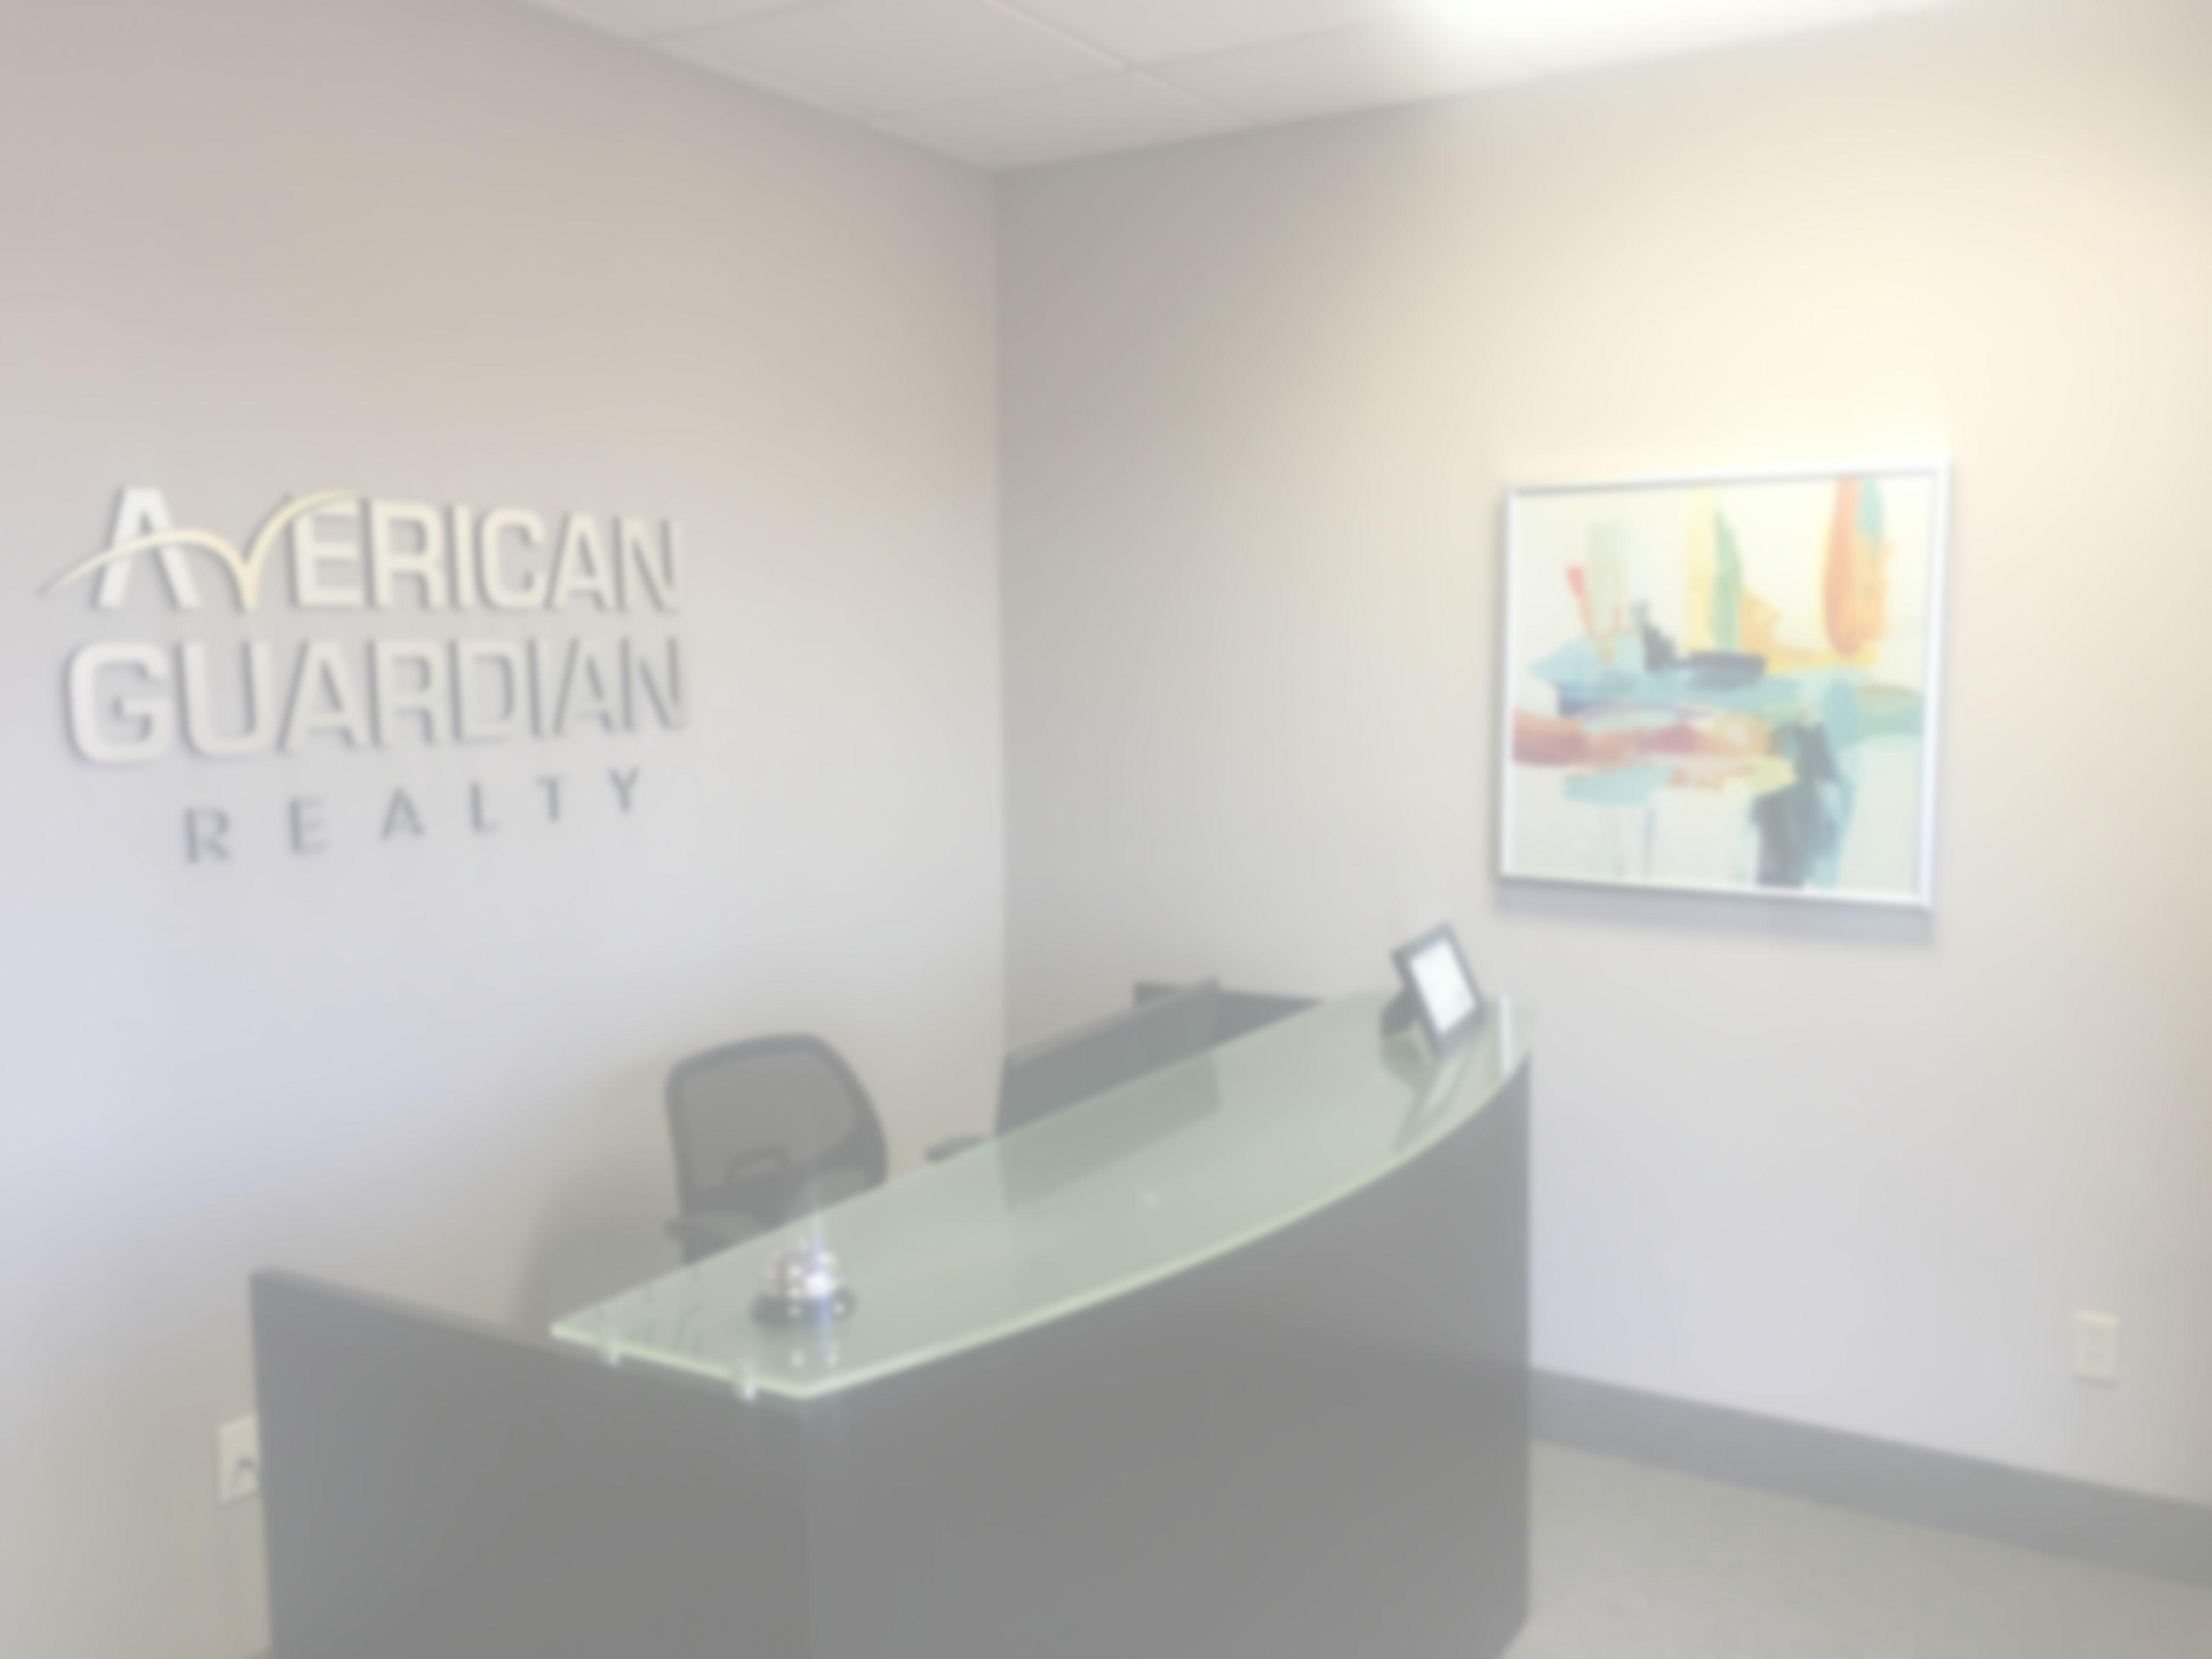 American Guardian Realty